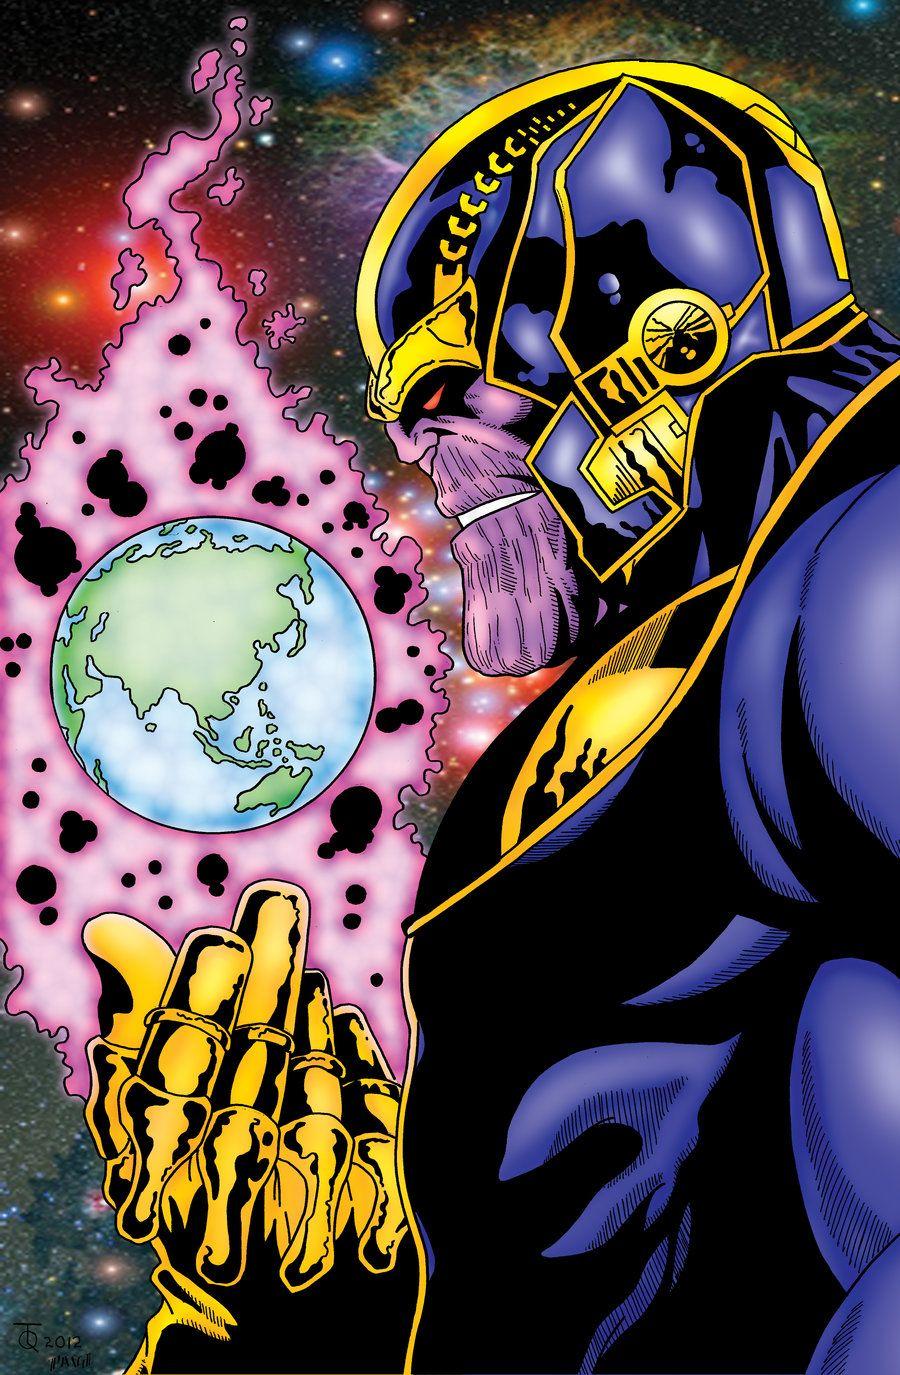 Thanos+The+Dark+Titan+by+pascal-verhoef.deviantart.com